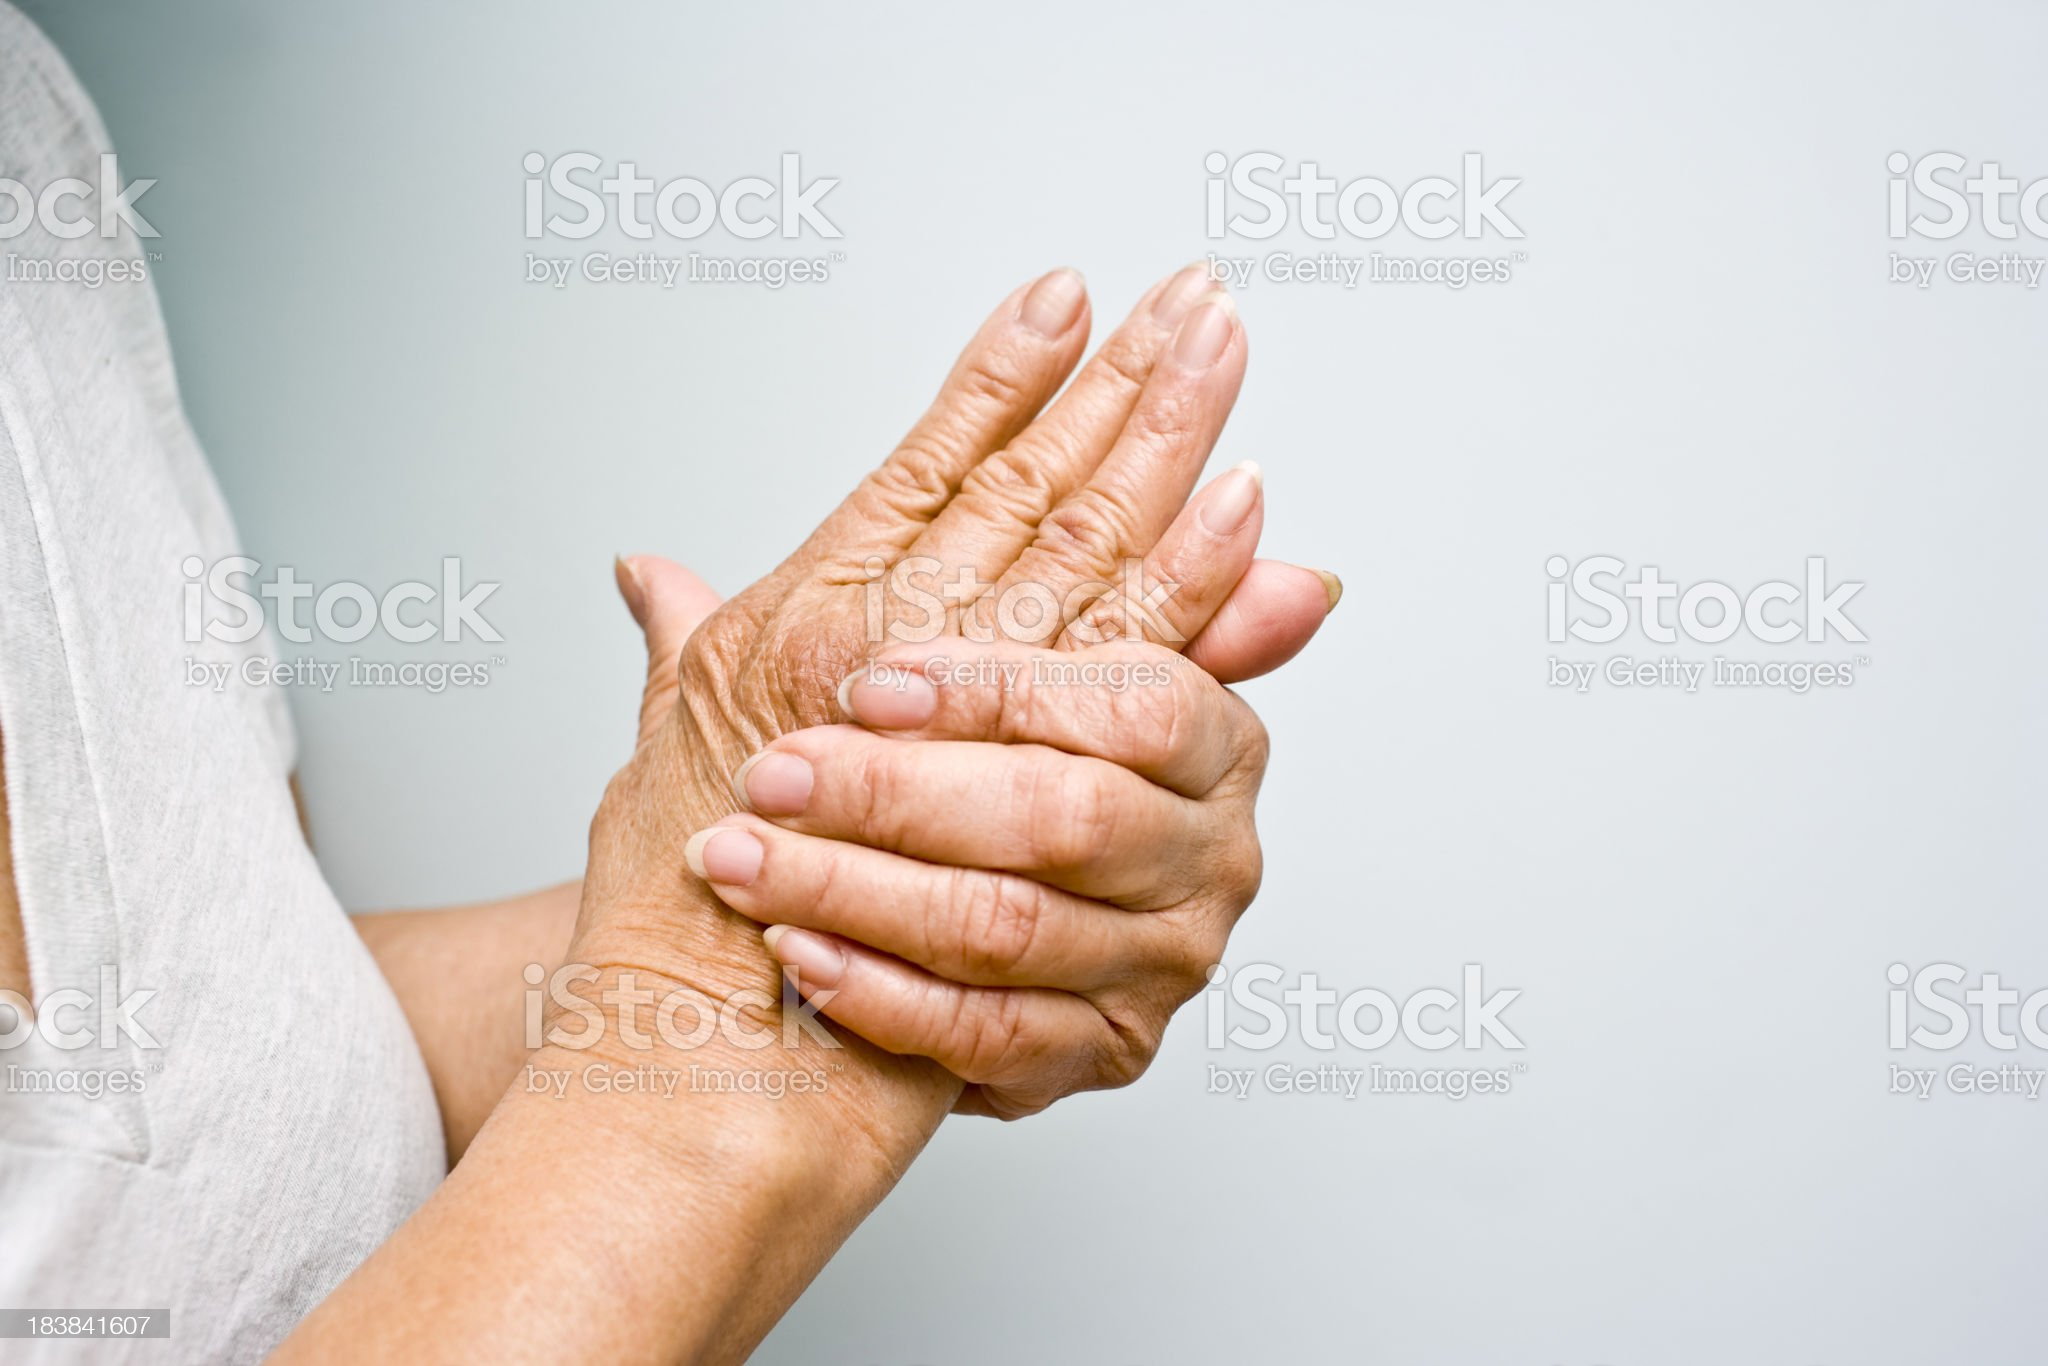 Elderly woman grasping arthritic hands royalty-free stock photo